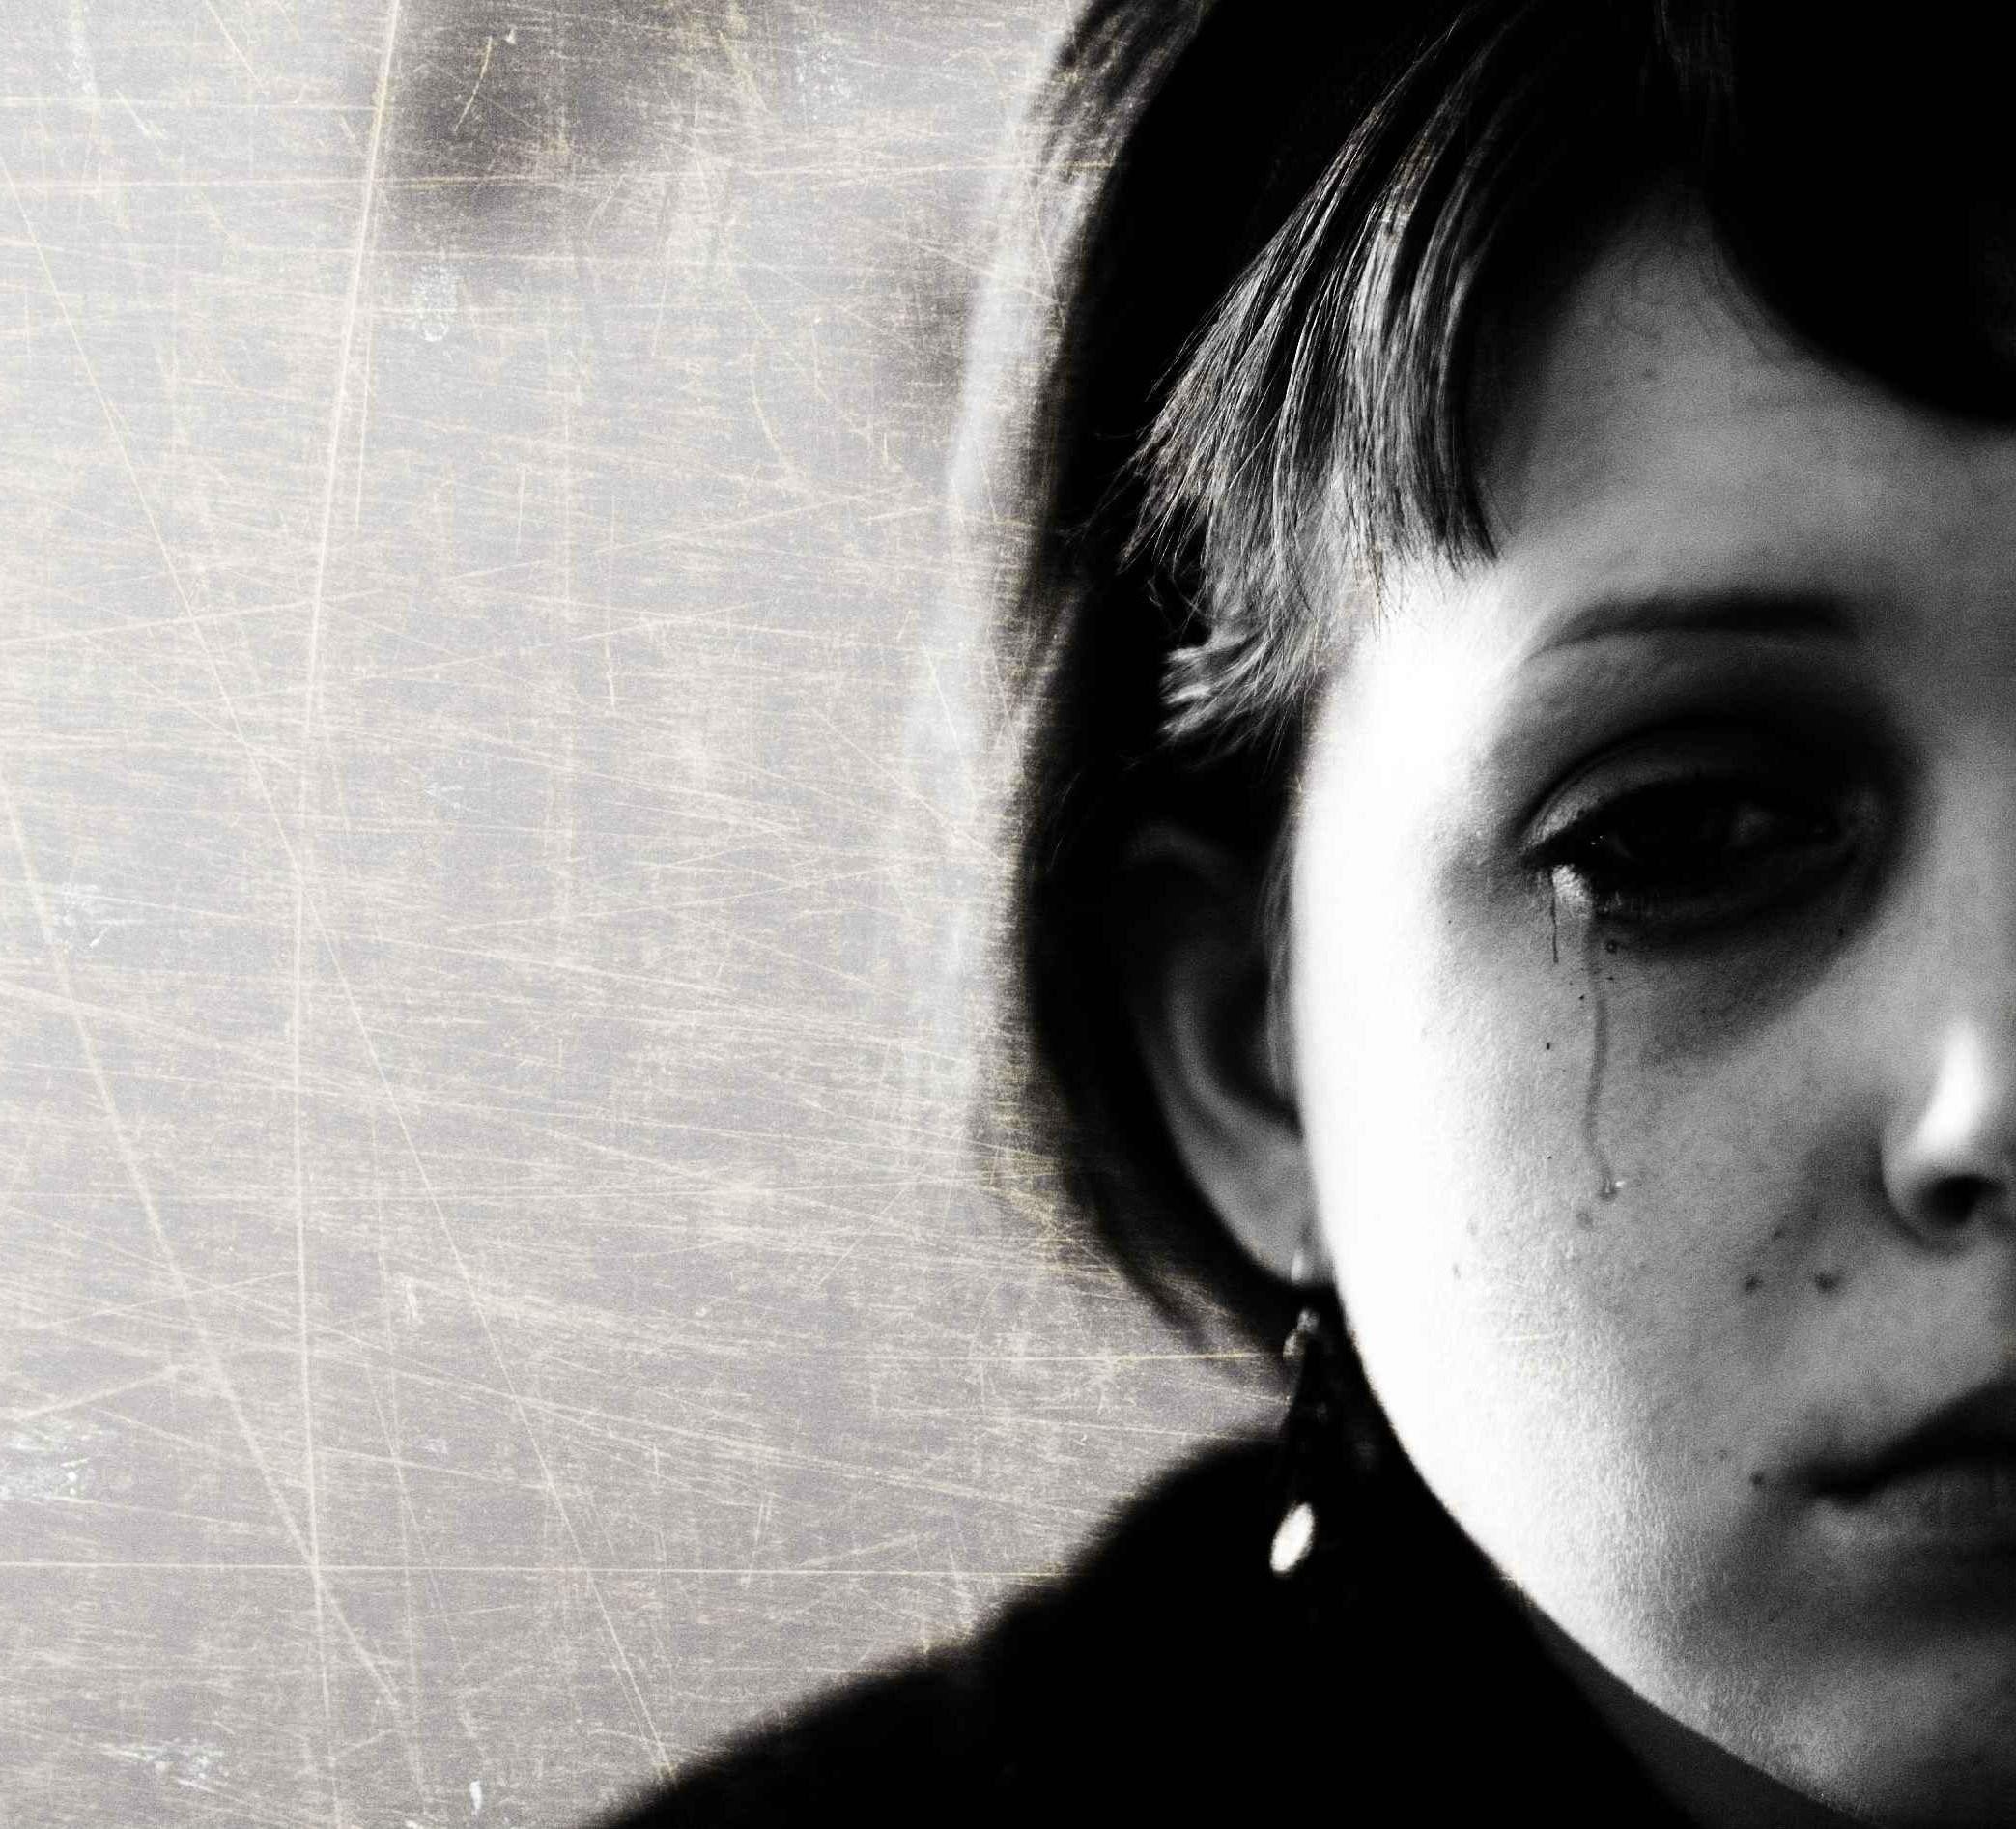 Hd Sad Wallpapers: Sad Face Wallpapers (54+ Images